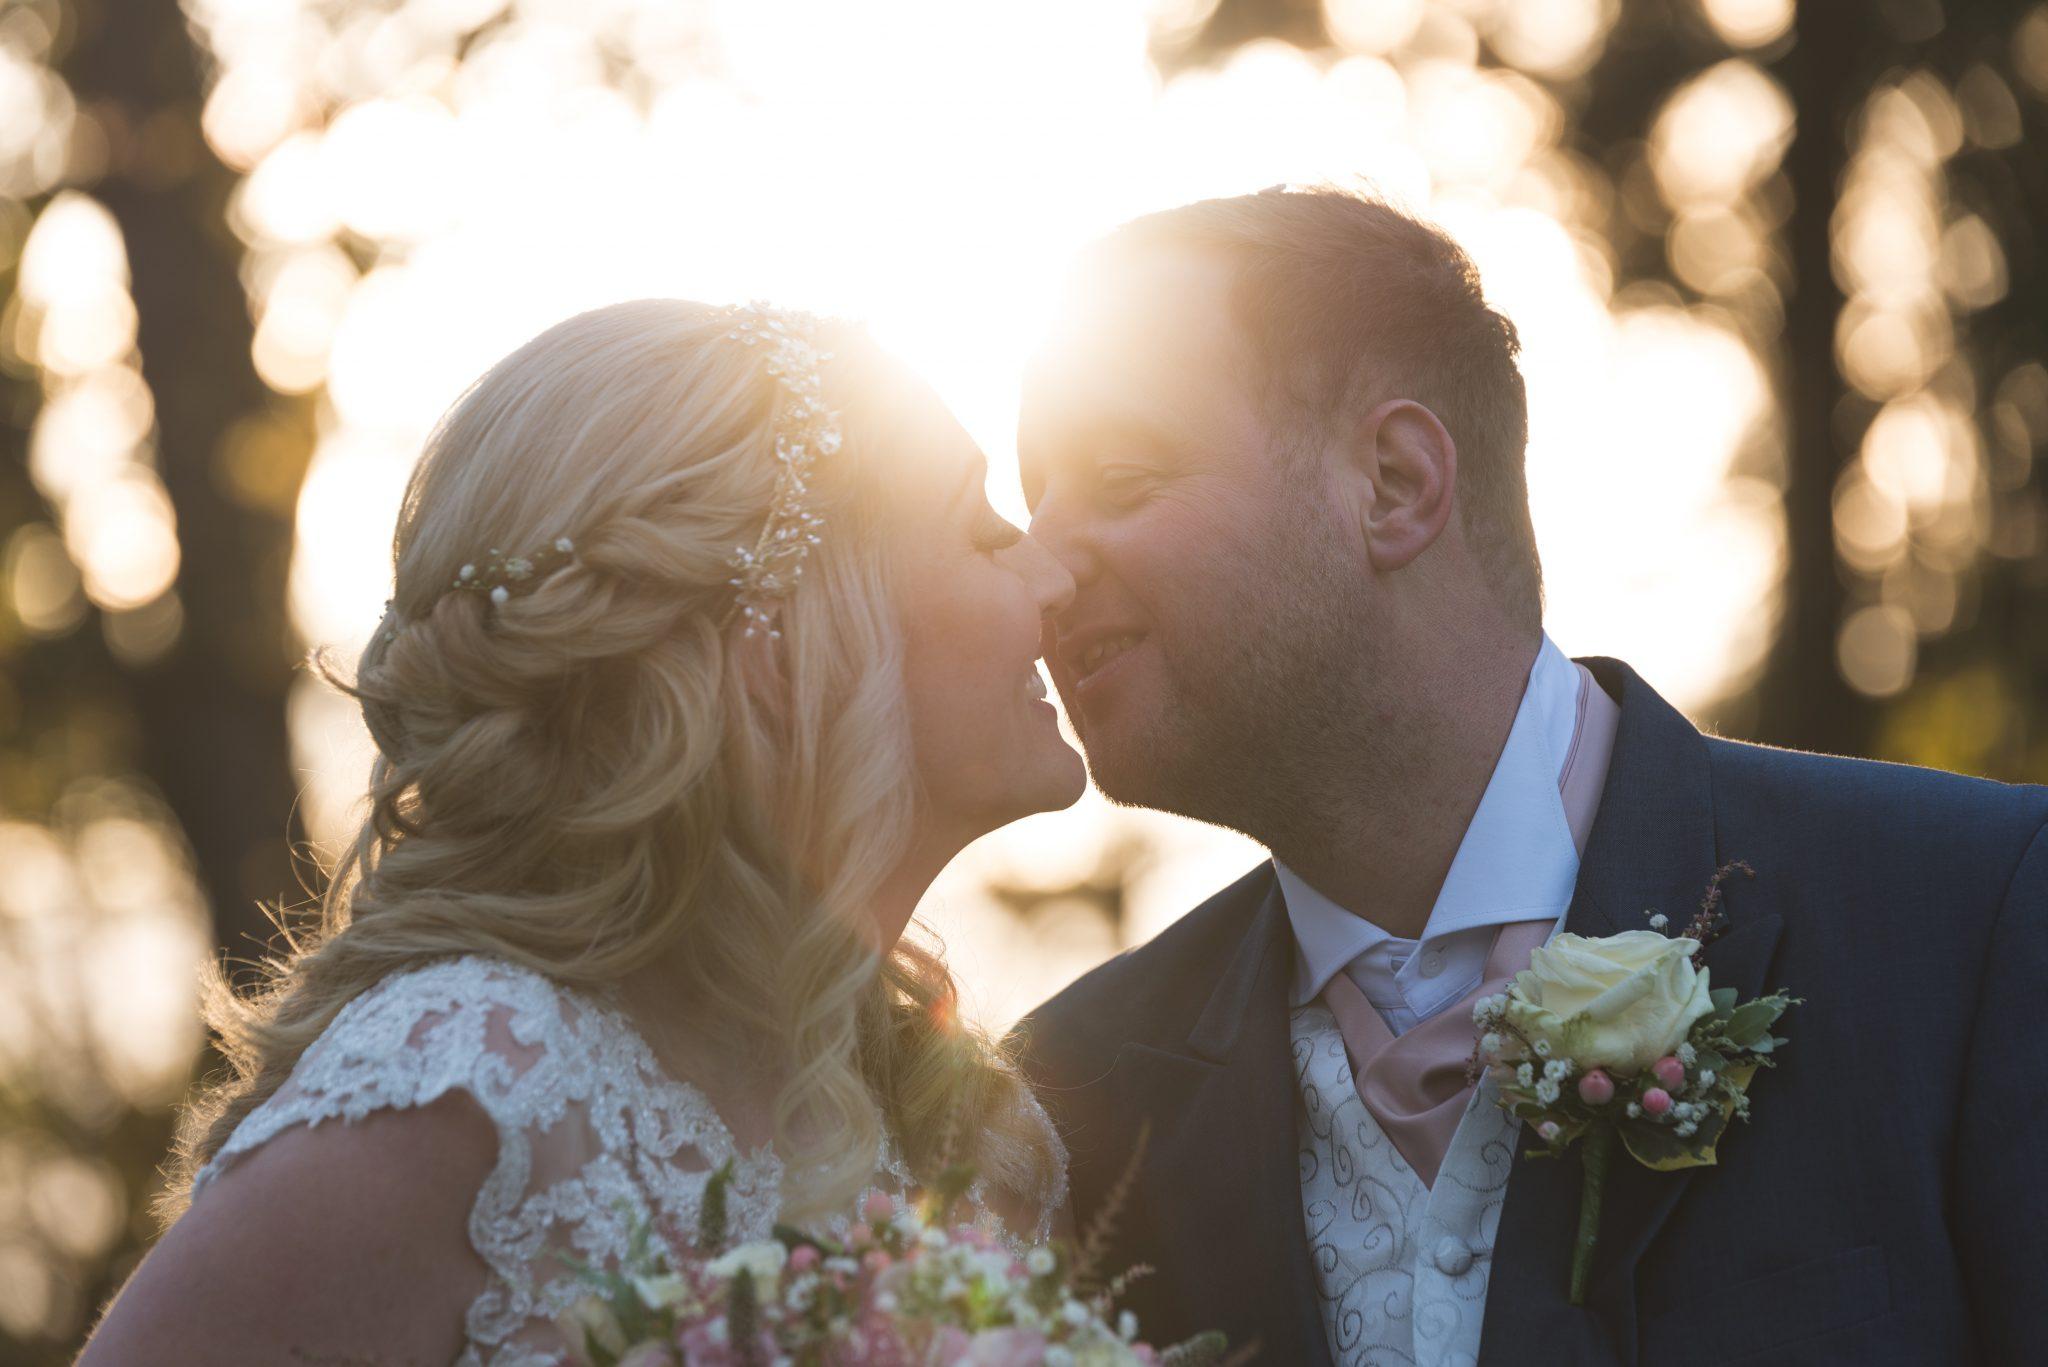 Wedding Photographer Dudley, Kidderminster, Stourbridge - Beautiful, Relaxed Wedding Photography